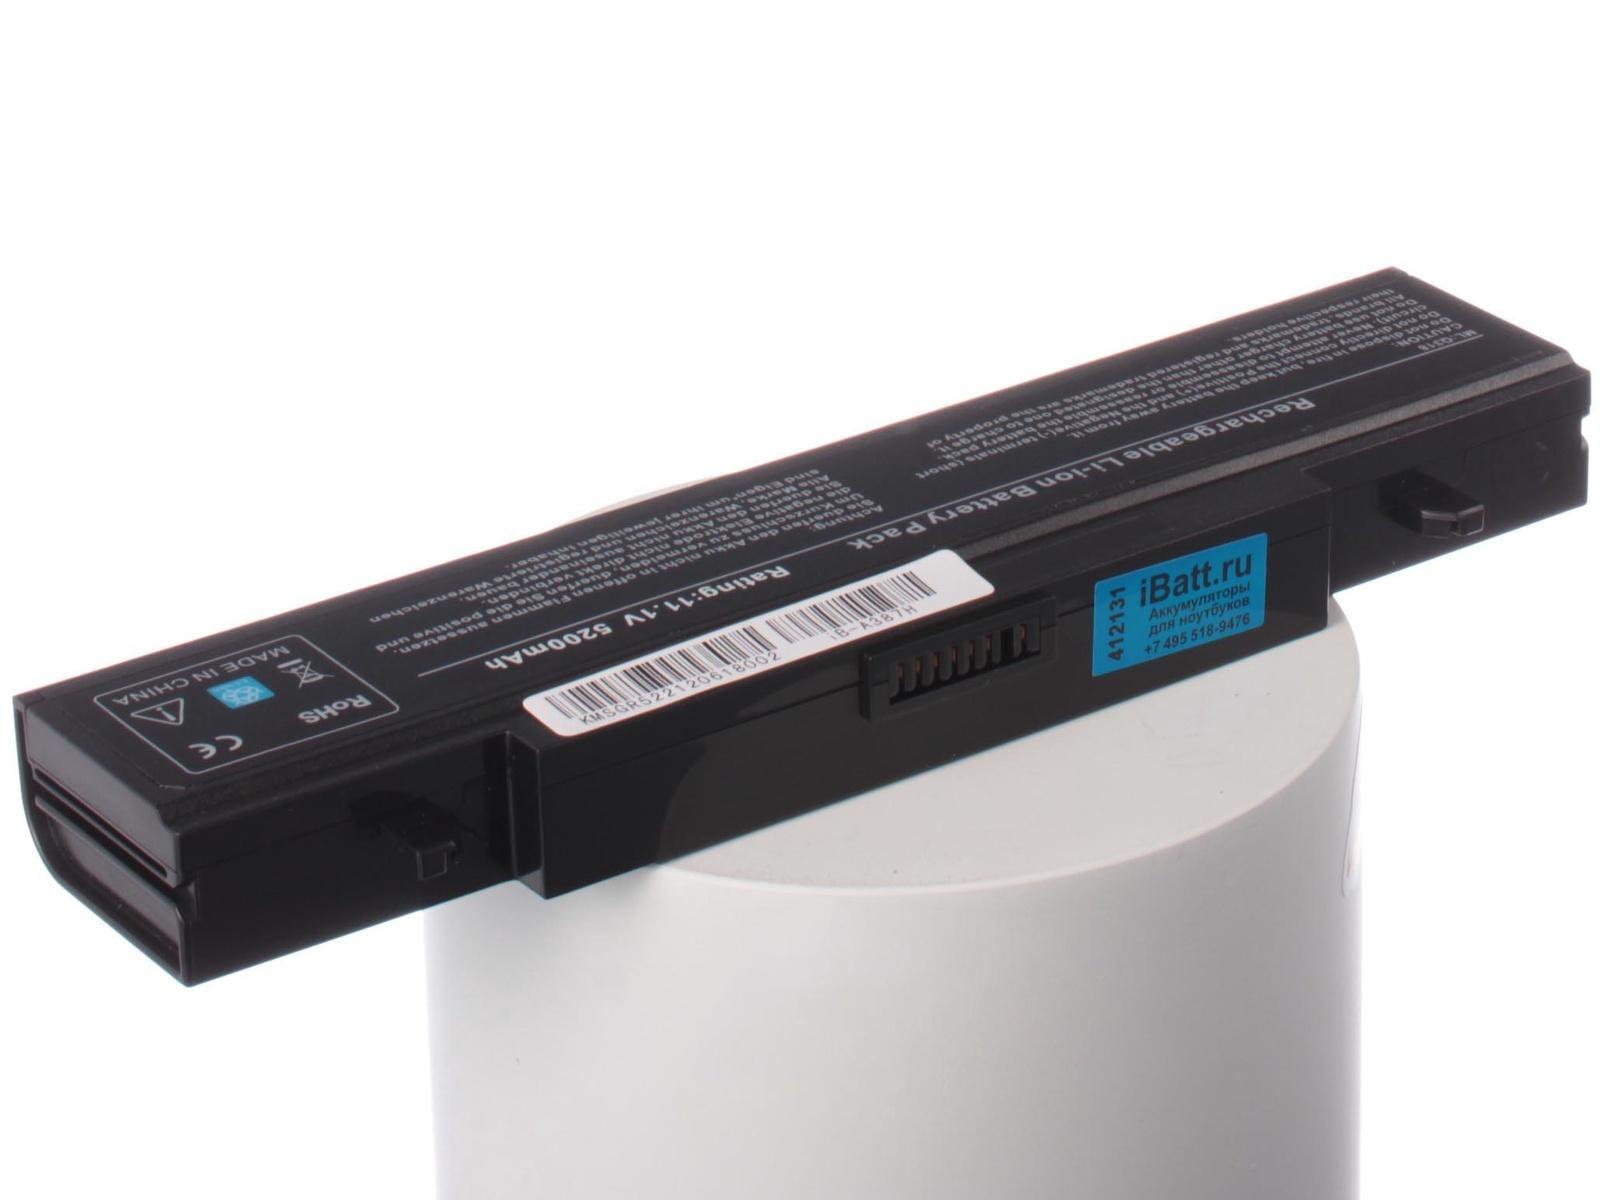 Аккумулятор для ноутбука iBatt для Samsung 305E5Z-S07, 305V5A-S05, 305V5A-S08, 305V5A-T05, 310E5C-U03, 350V5C-S1J, NP355V4X, NP-R468, R719-JS01, RC510-S06, RC710-S03, RF411, RV520-S09, RV520-S0H, 200A5B-S01, 300E4A-A01 аккумулятор для ноутбука ibatt для samsung 355e5x rv518 rv720 350e7c 355e5c 305e7a np r590 350v5x ativ book 2 np r440l np r522 np r469 q530 q430 r423 200a5b 305v5a s0k 355v5x 355e5x a01 300e7z s02 200a4b